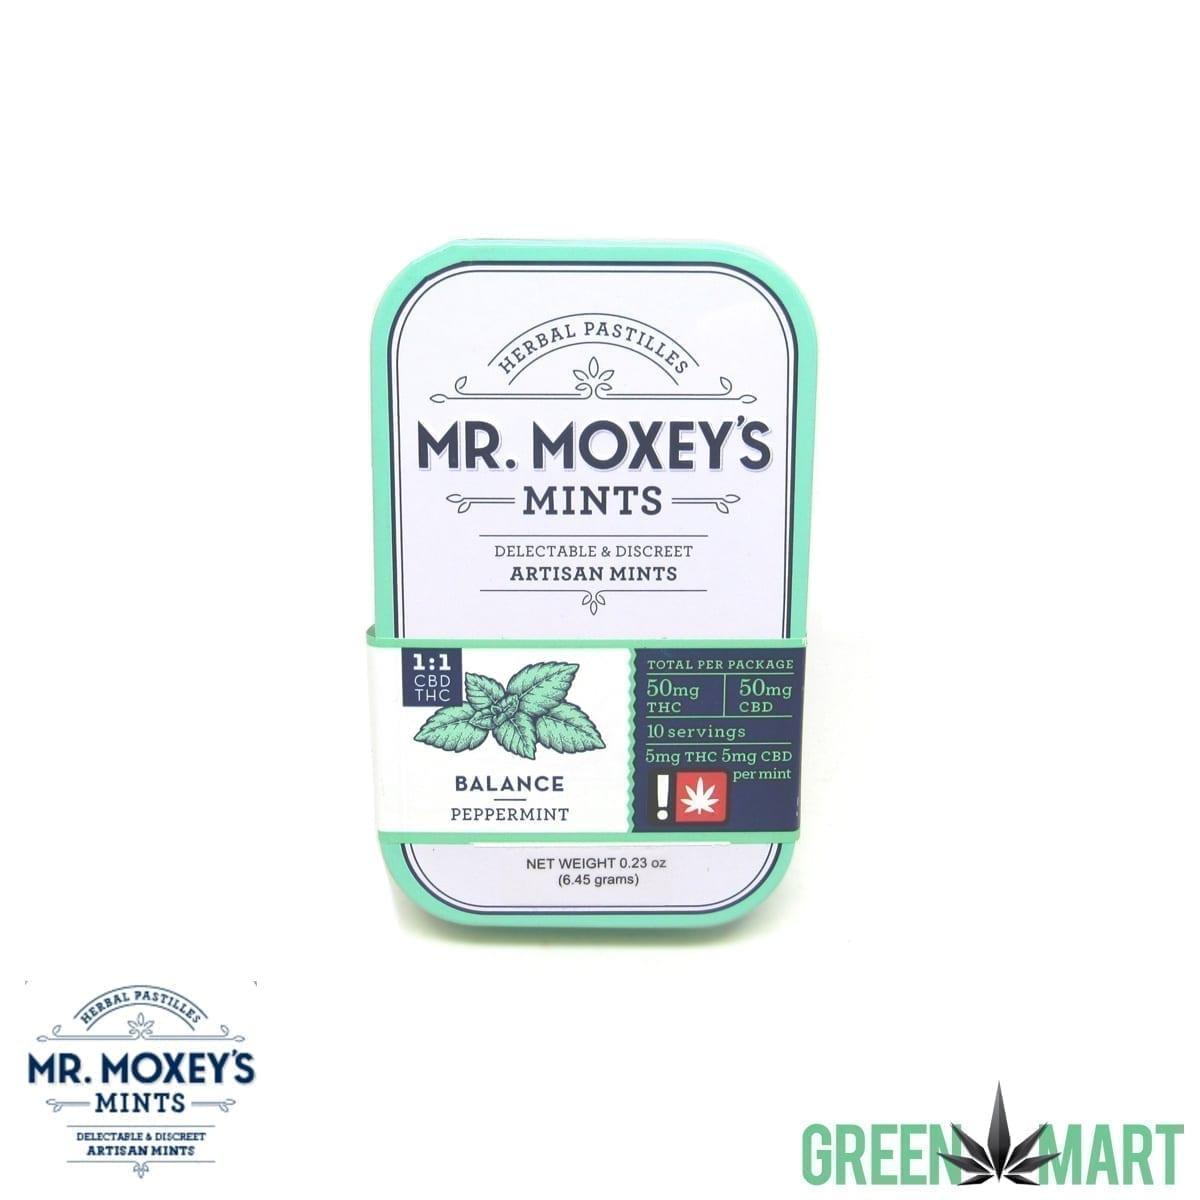 Mr. Moxey's Mints - 1:1 Balance Peppermint